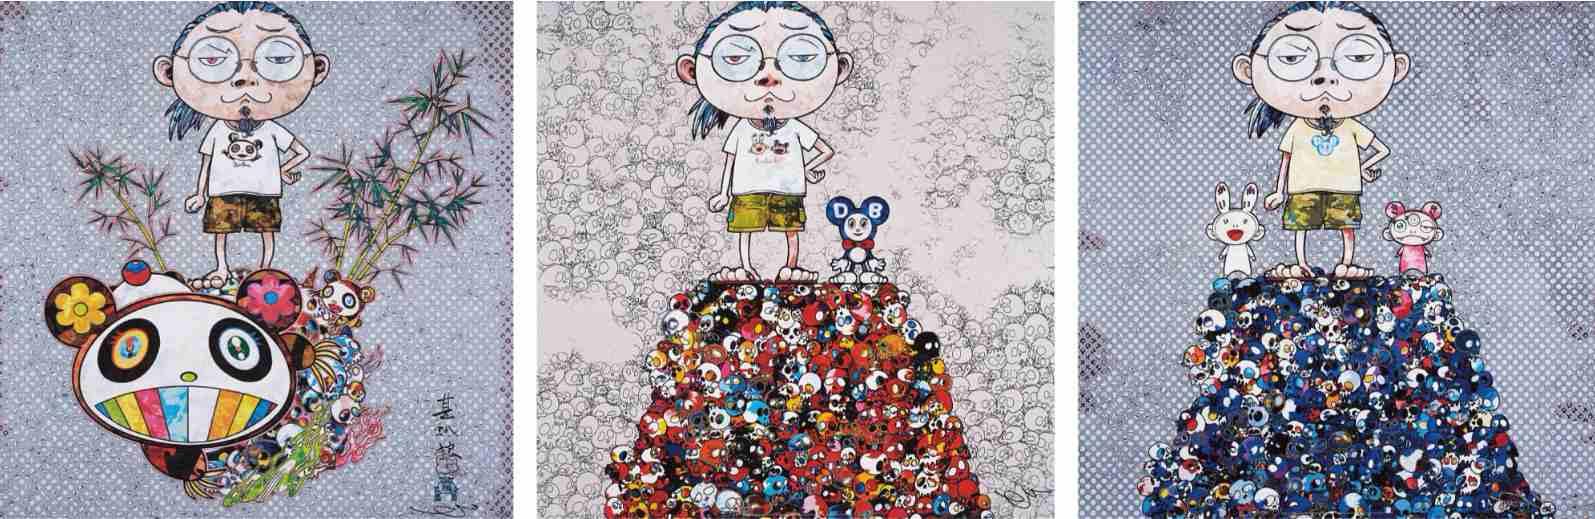 Takashi Murakami-I Met a Panda Family, Kaikai Kiki and Me-On the Blue Mound of the Dead, Dob and Me-On the Red Mound of the Dead-2013